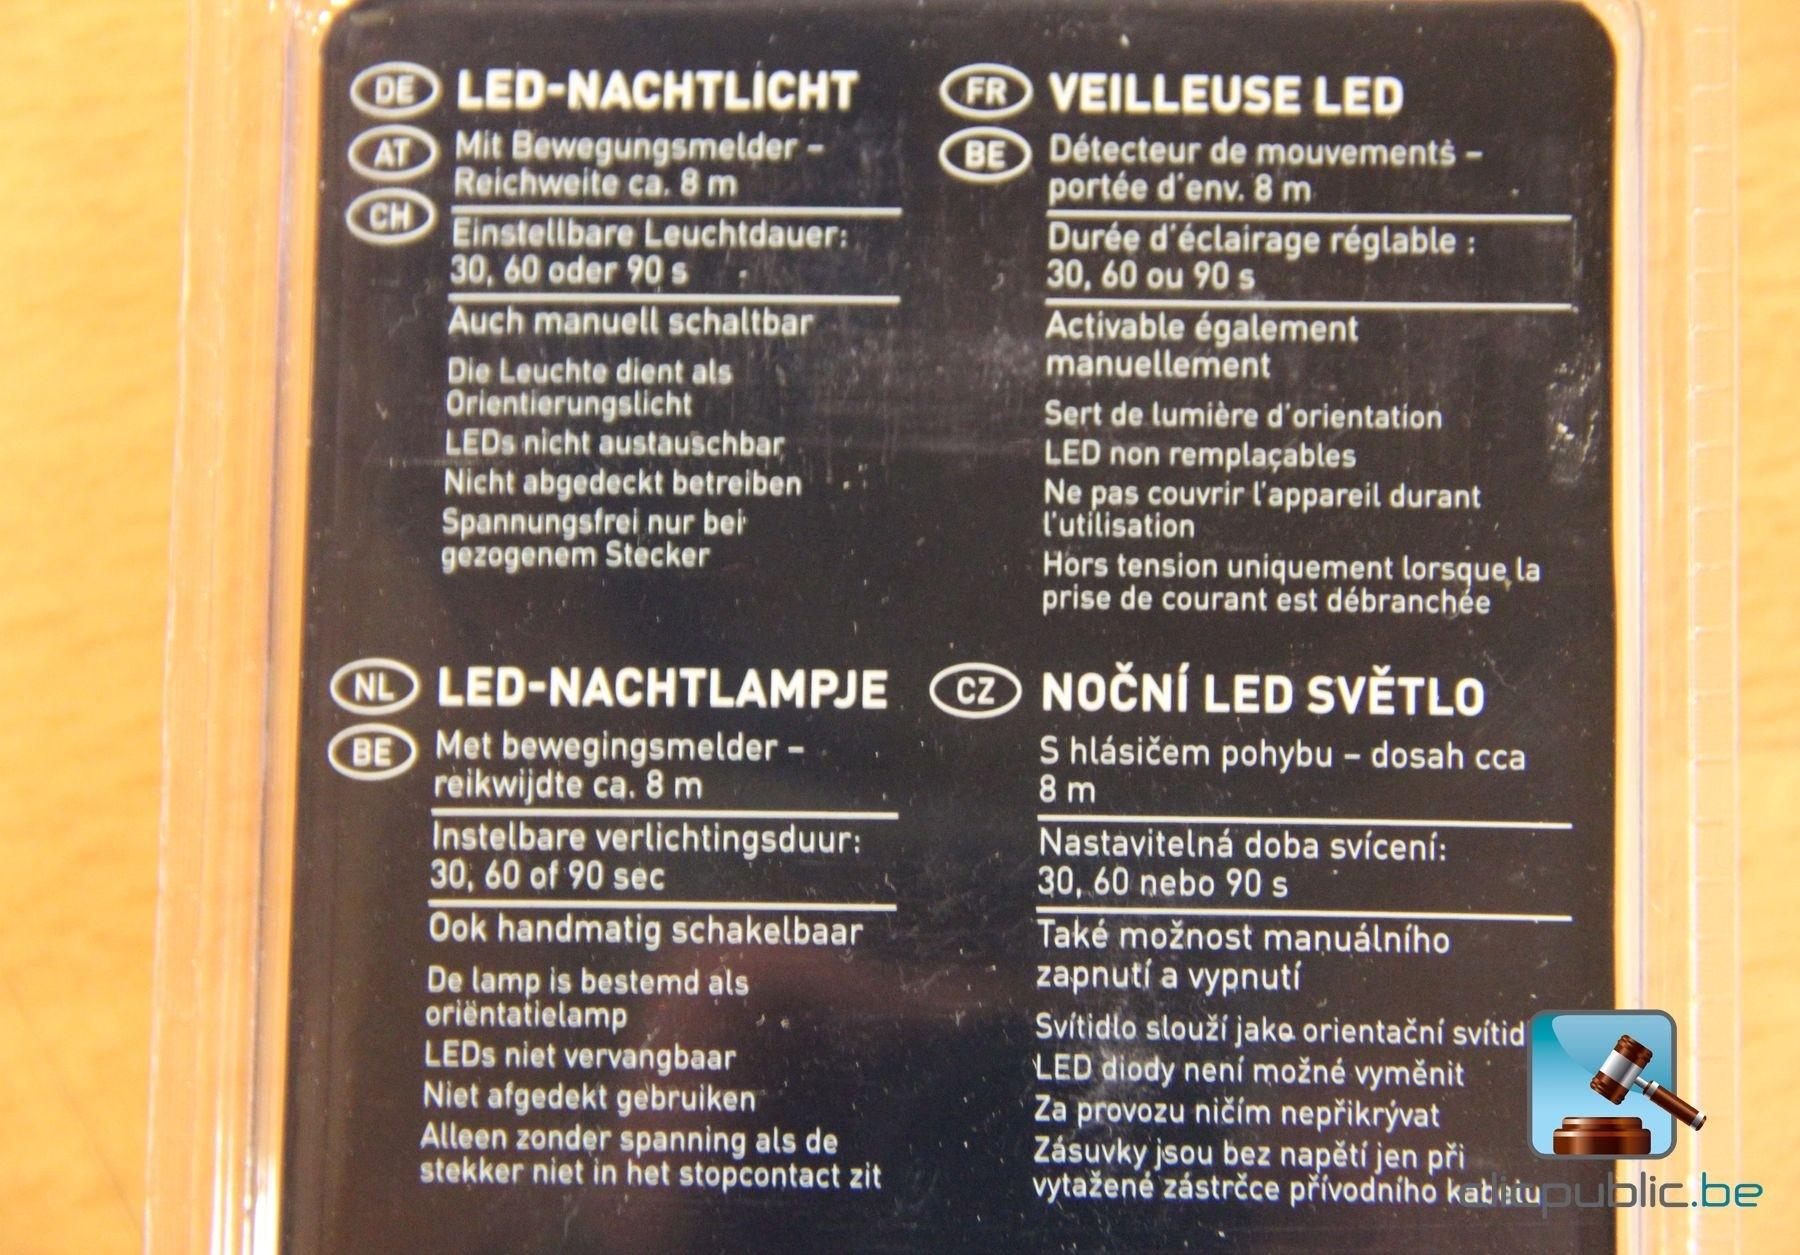 Livarno led night light - 40 Led Night Lights Livarno Lux Ref 7003 31